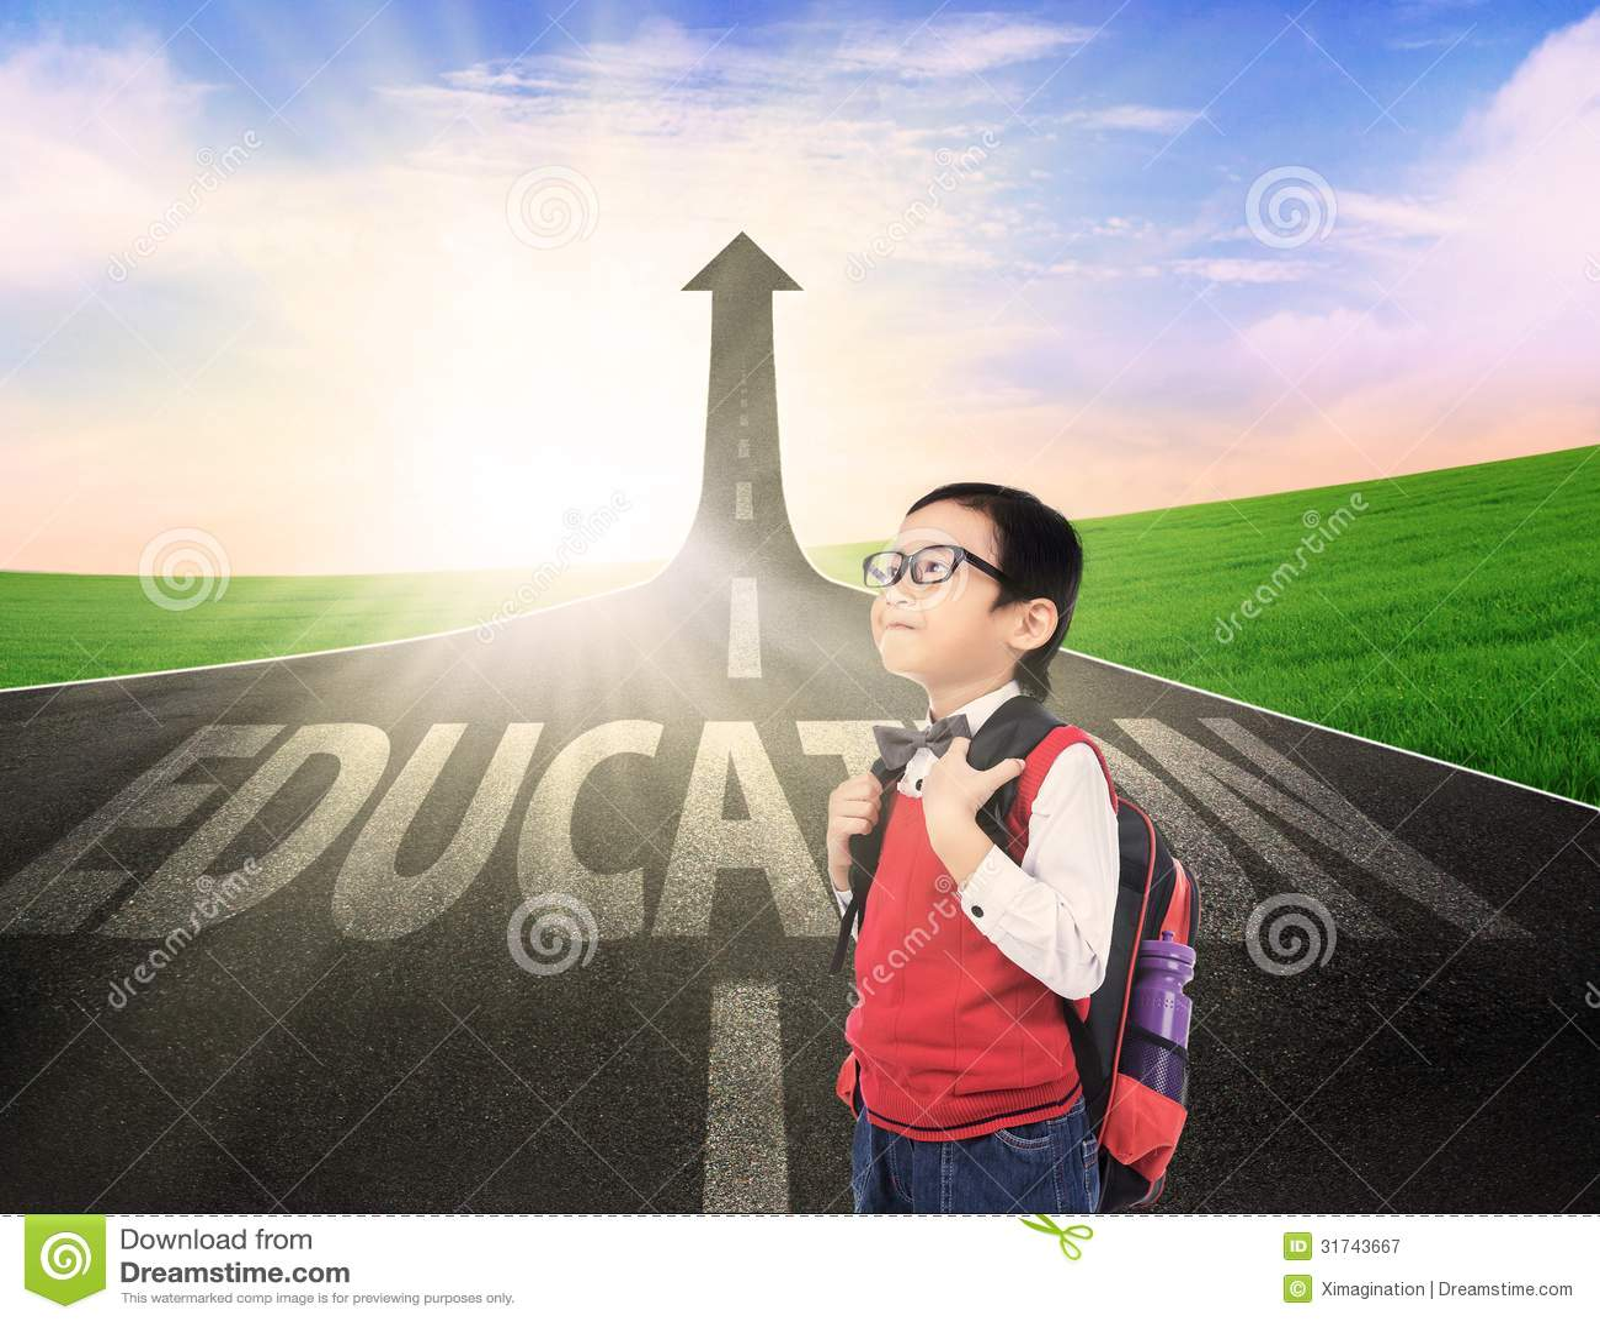 Boy Student On Education Success Road Stock Illustration ...